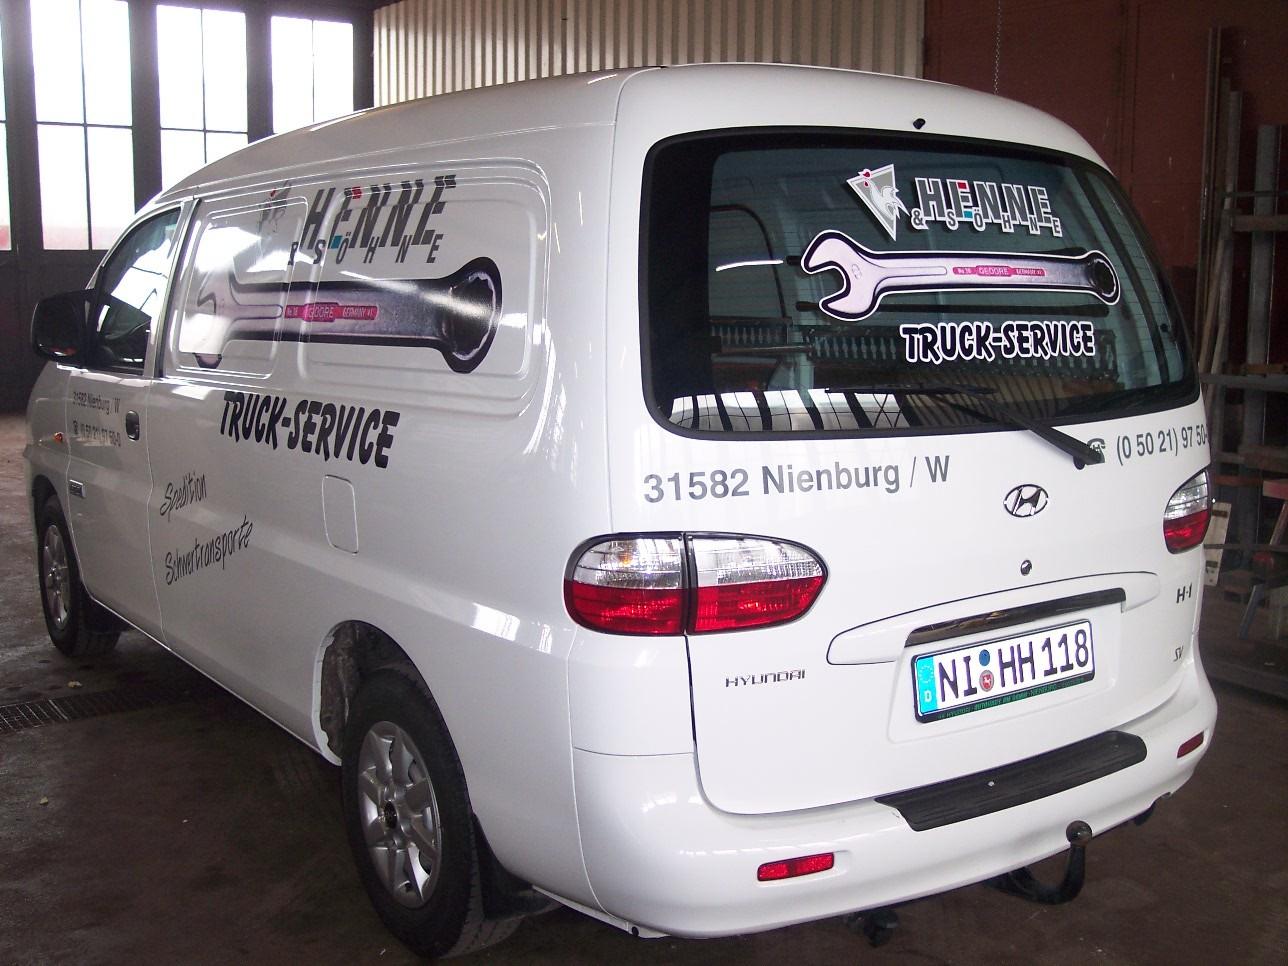 Henne Truck Service